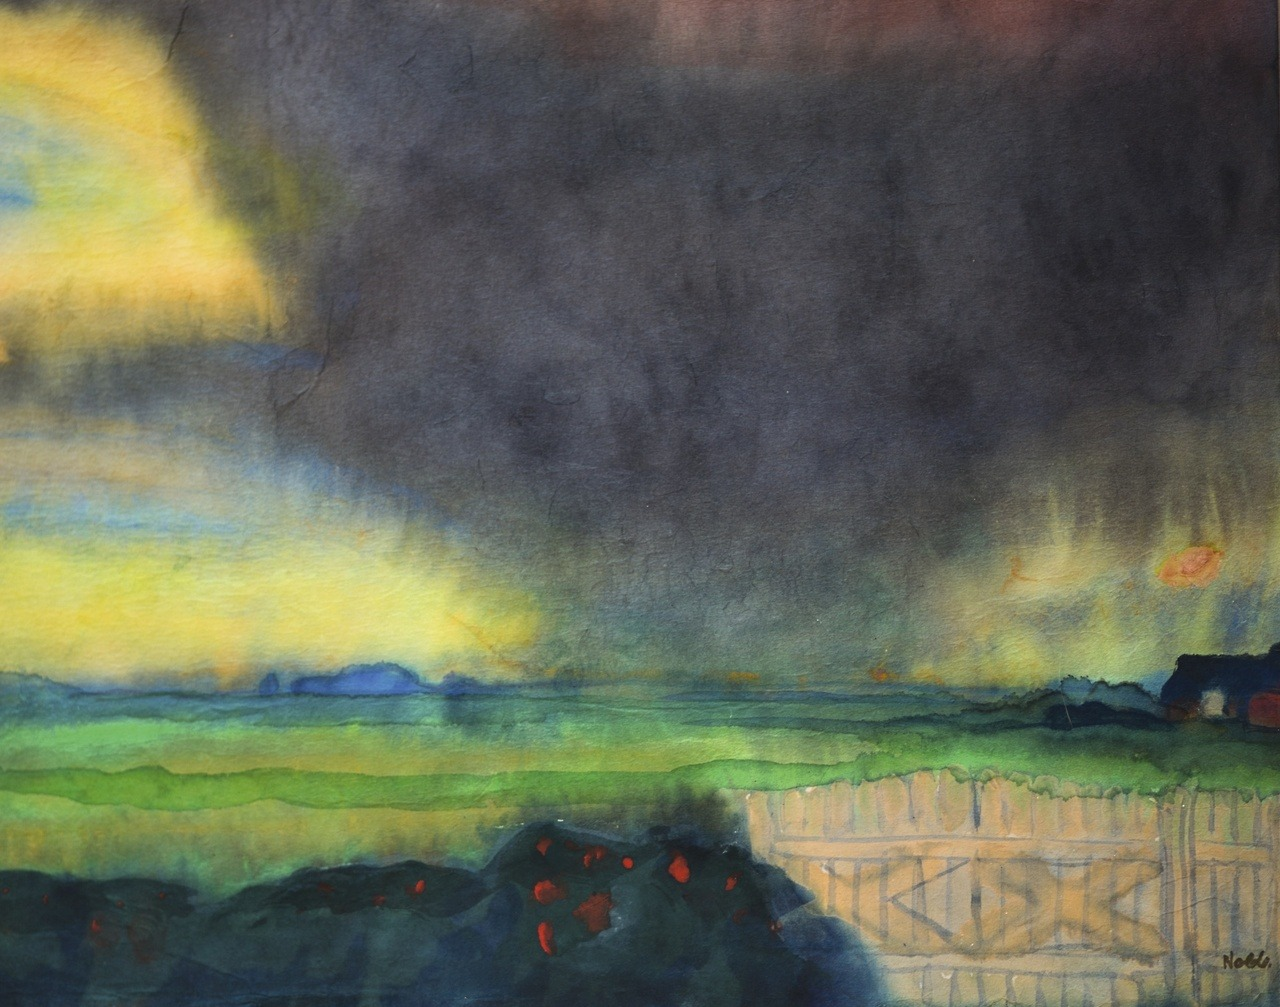 "thunderstruck9:""Emil Nolde (German, 1867-1956), Marschlandschaft mit Seebüllhof und Rosehecke [Marshland with Seebüll grounds and rose hedge], c.1935-40. Watercolour on paper, 33.2 x 42.2 cm."""